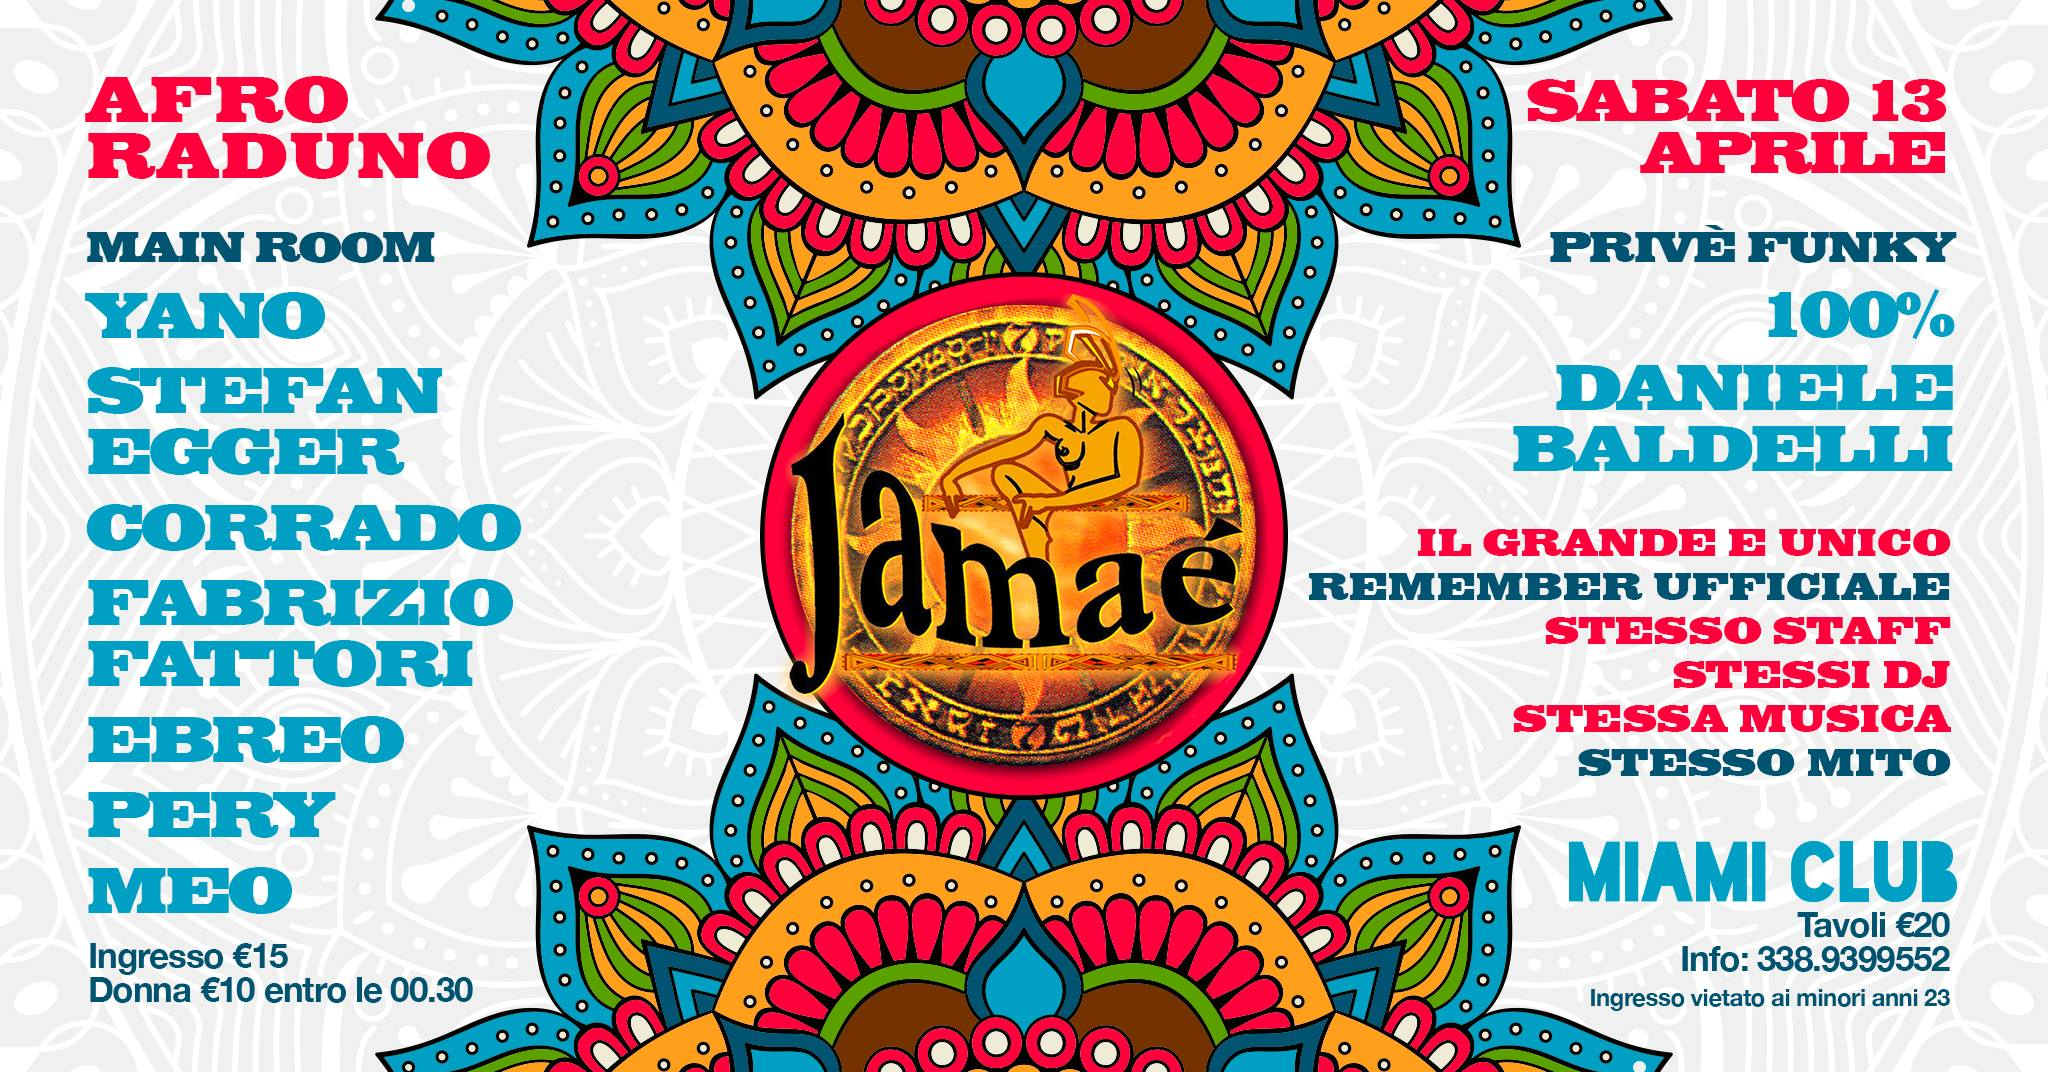 Remember Jamae Discoteca Miami Monsano